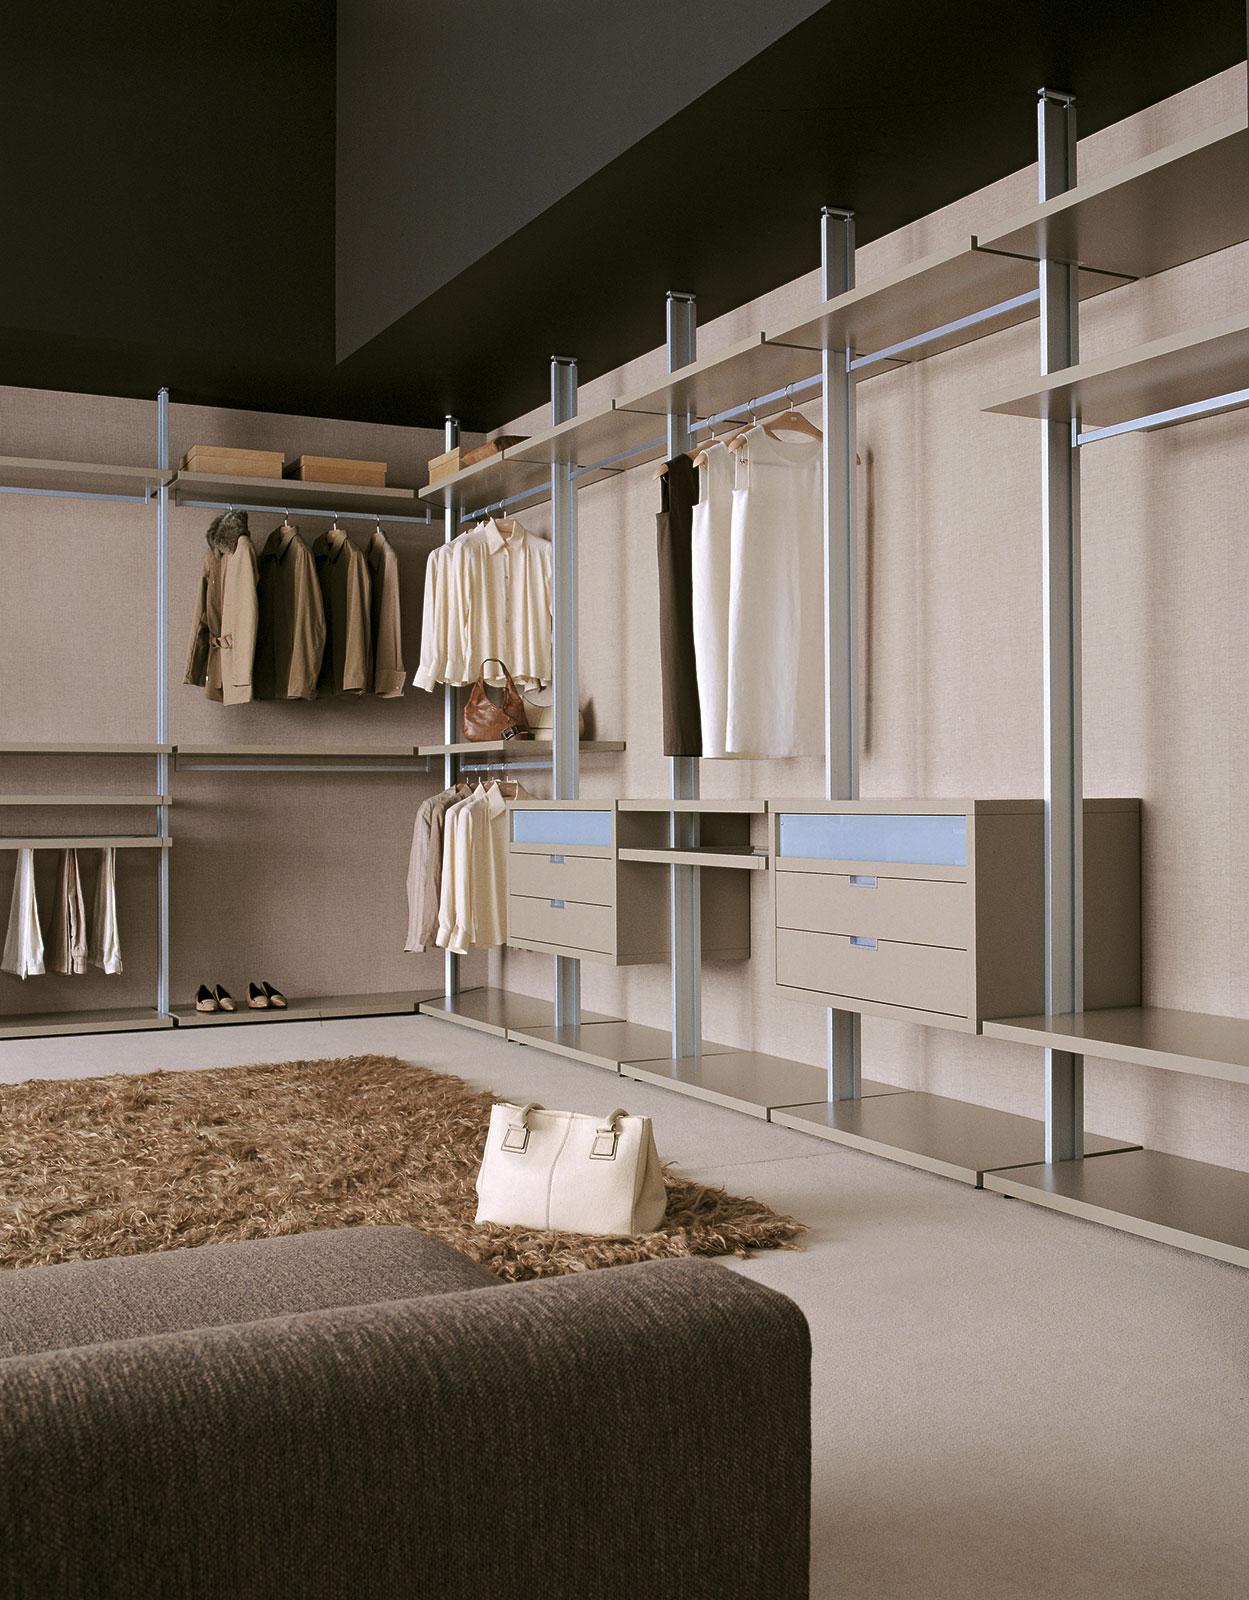 Cabina armadio su misura vesta henry glass for Cabina armadio